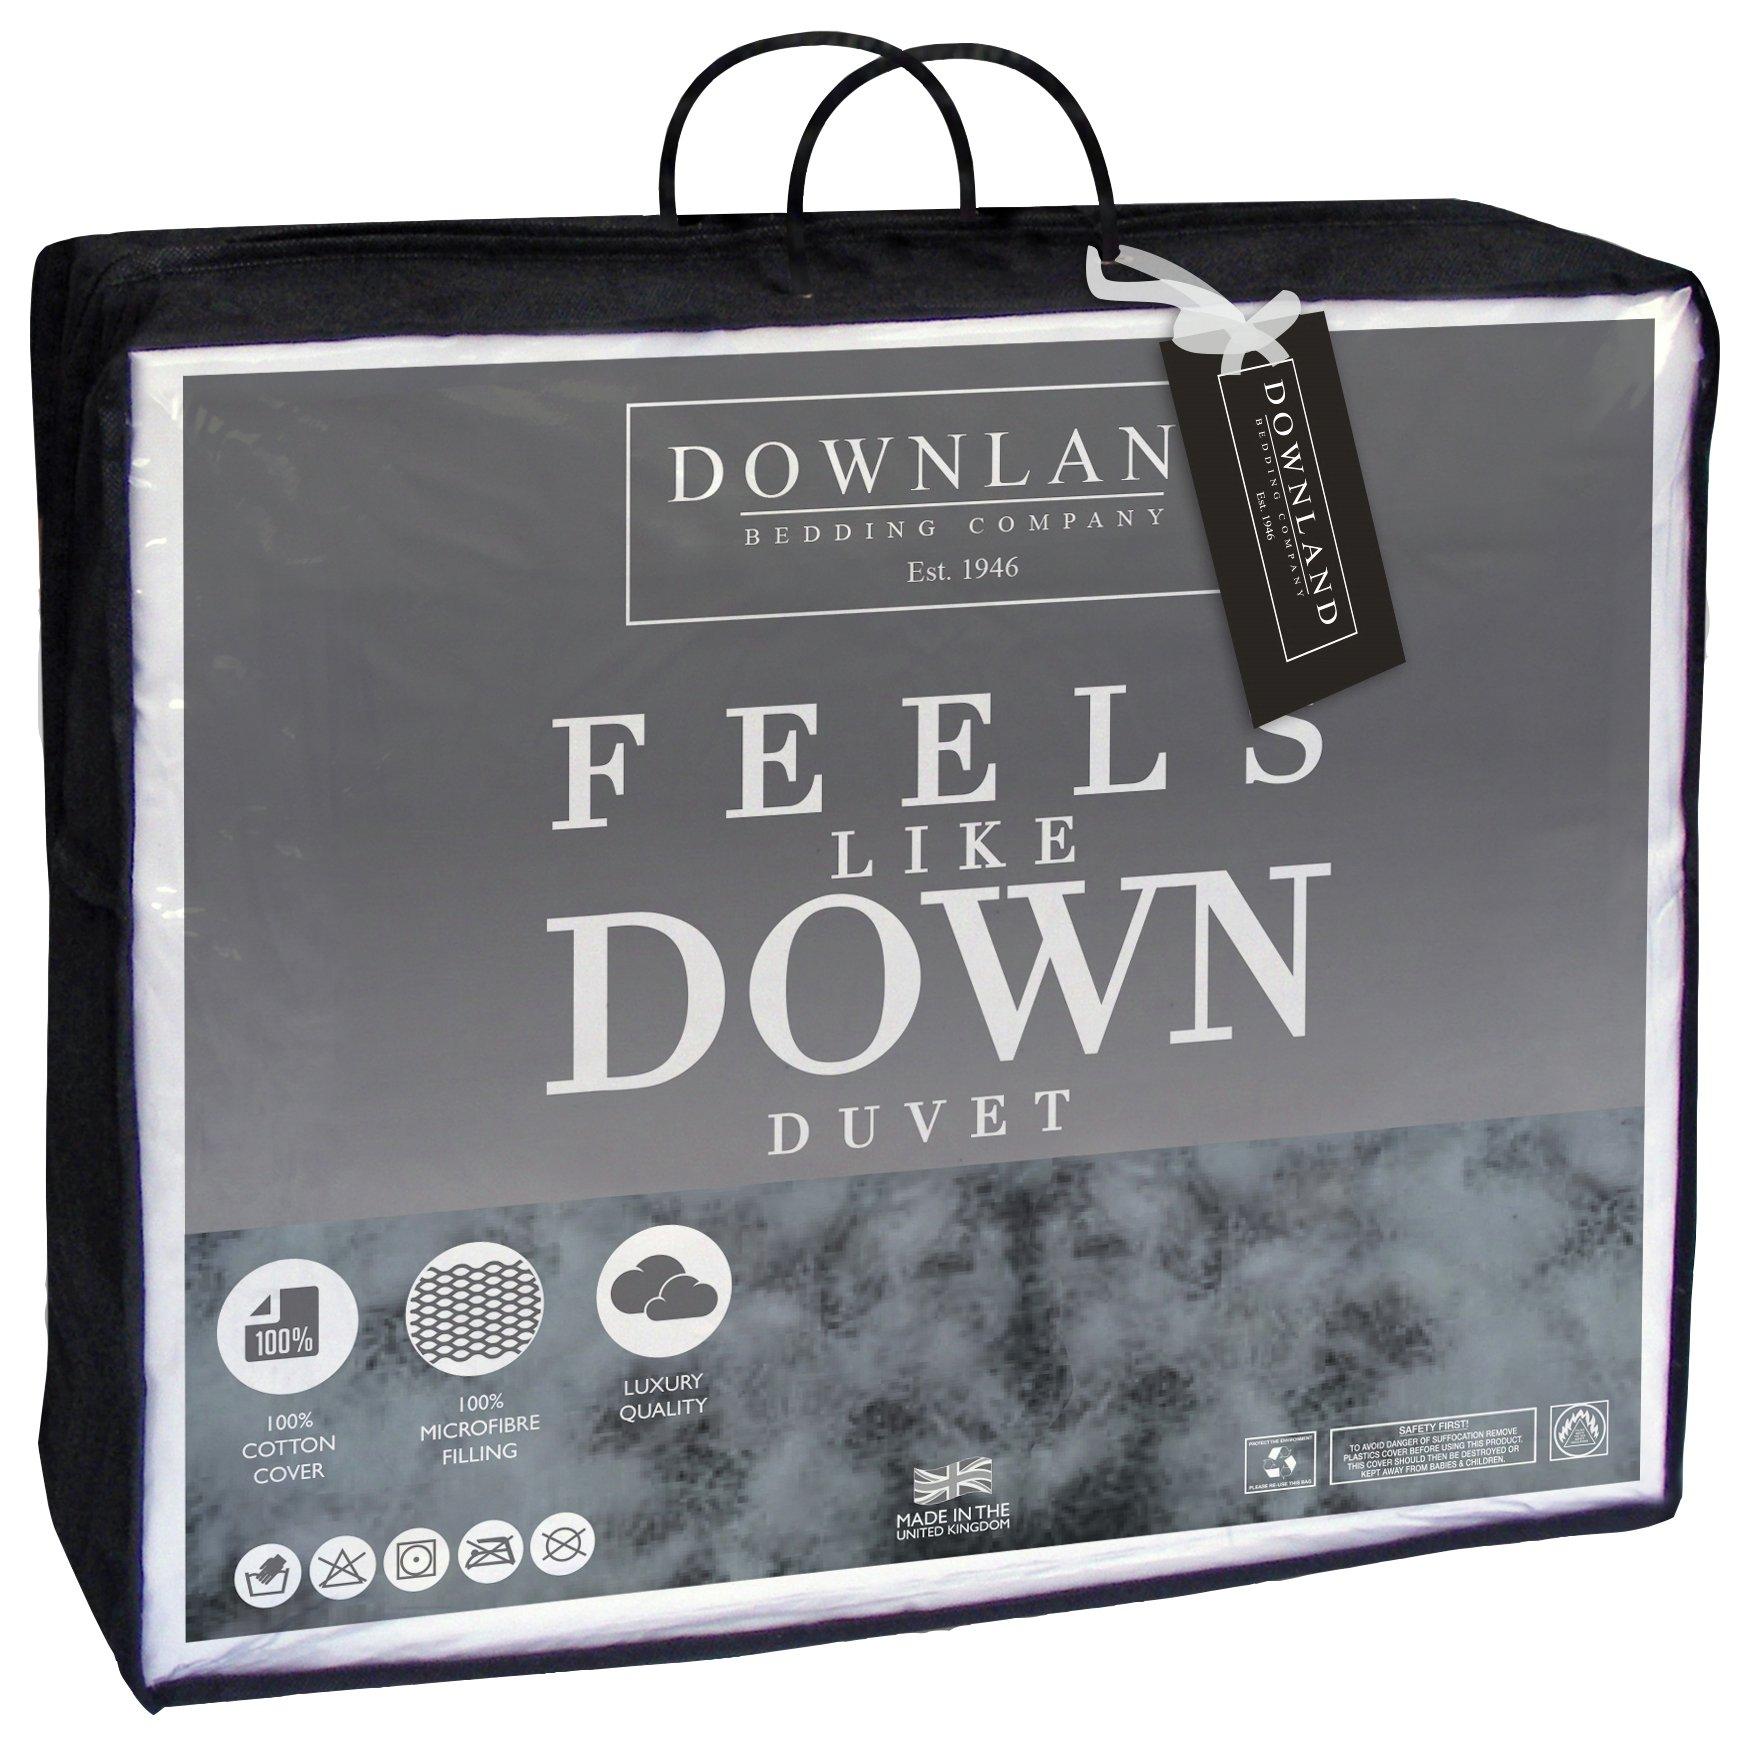 Image of Downland - 105 Tog Feels Like Down - Duvet - Single